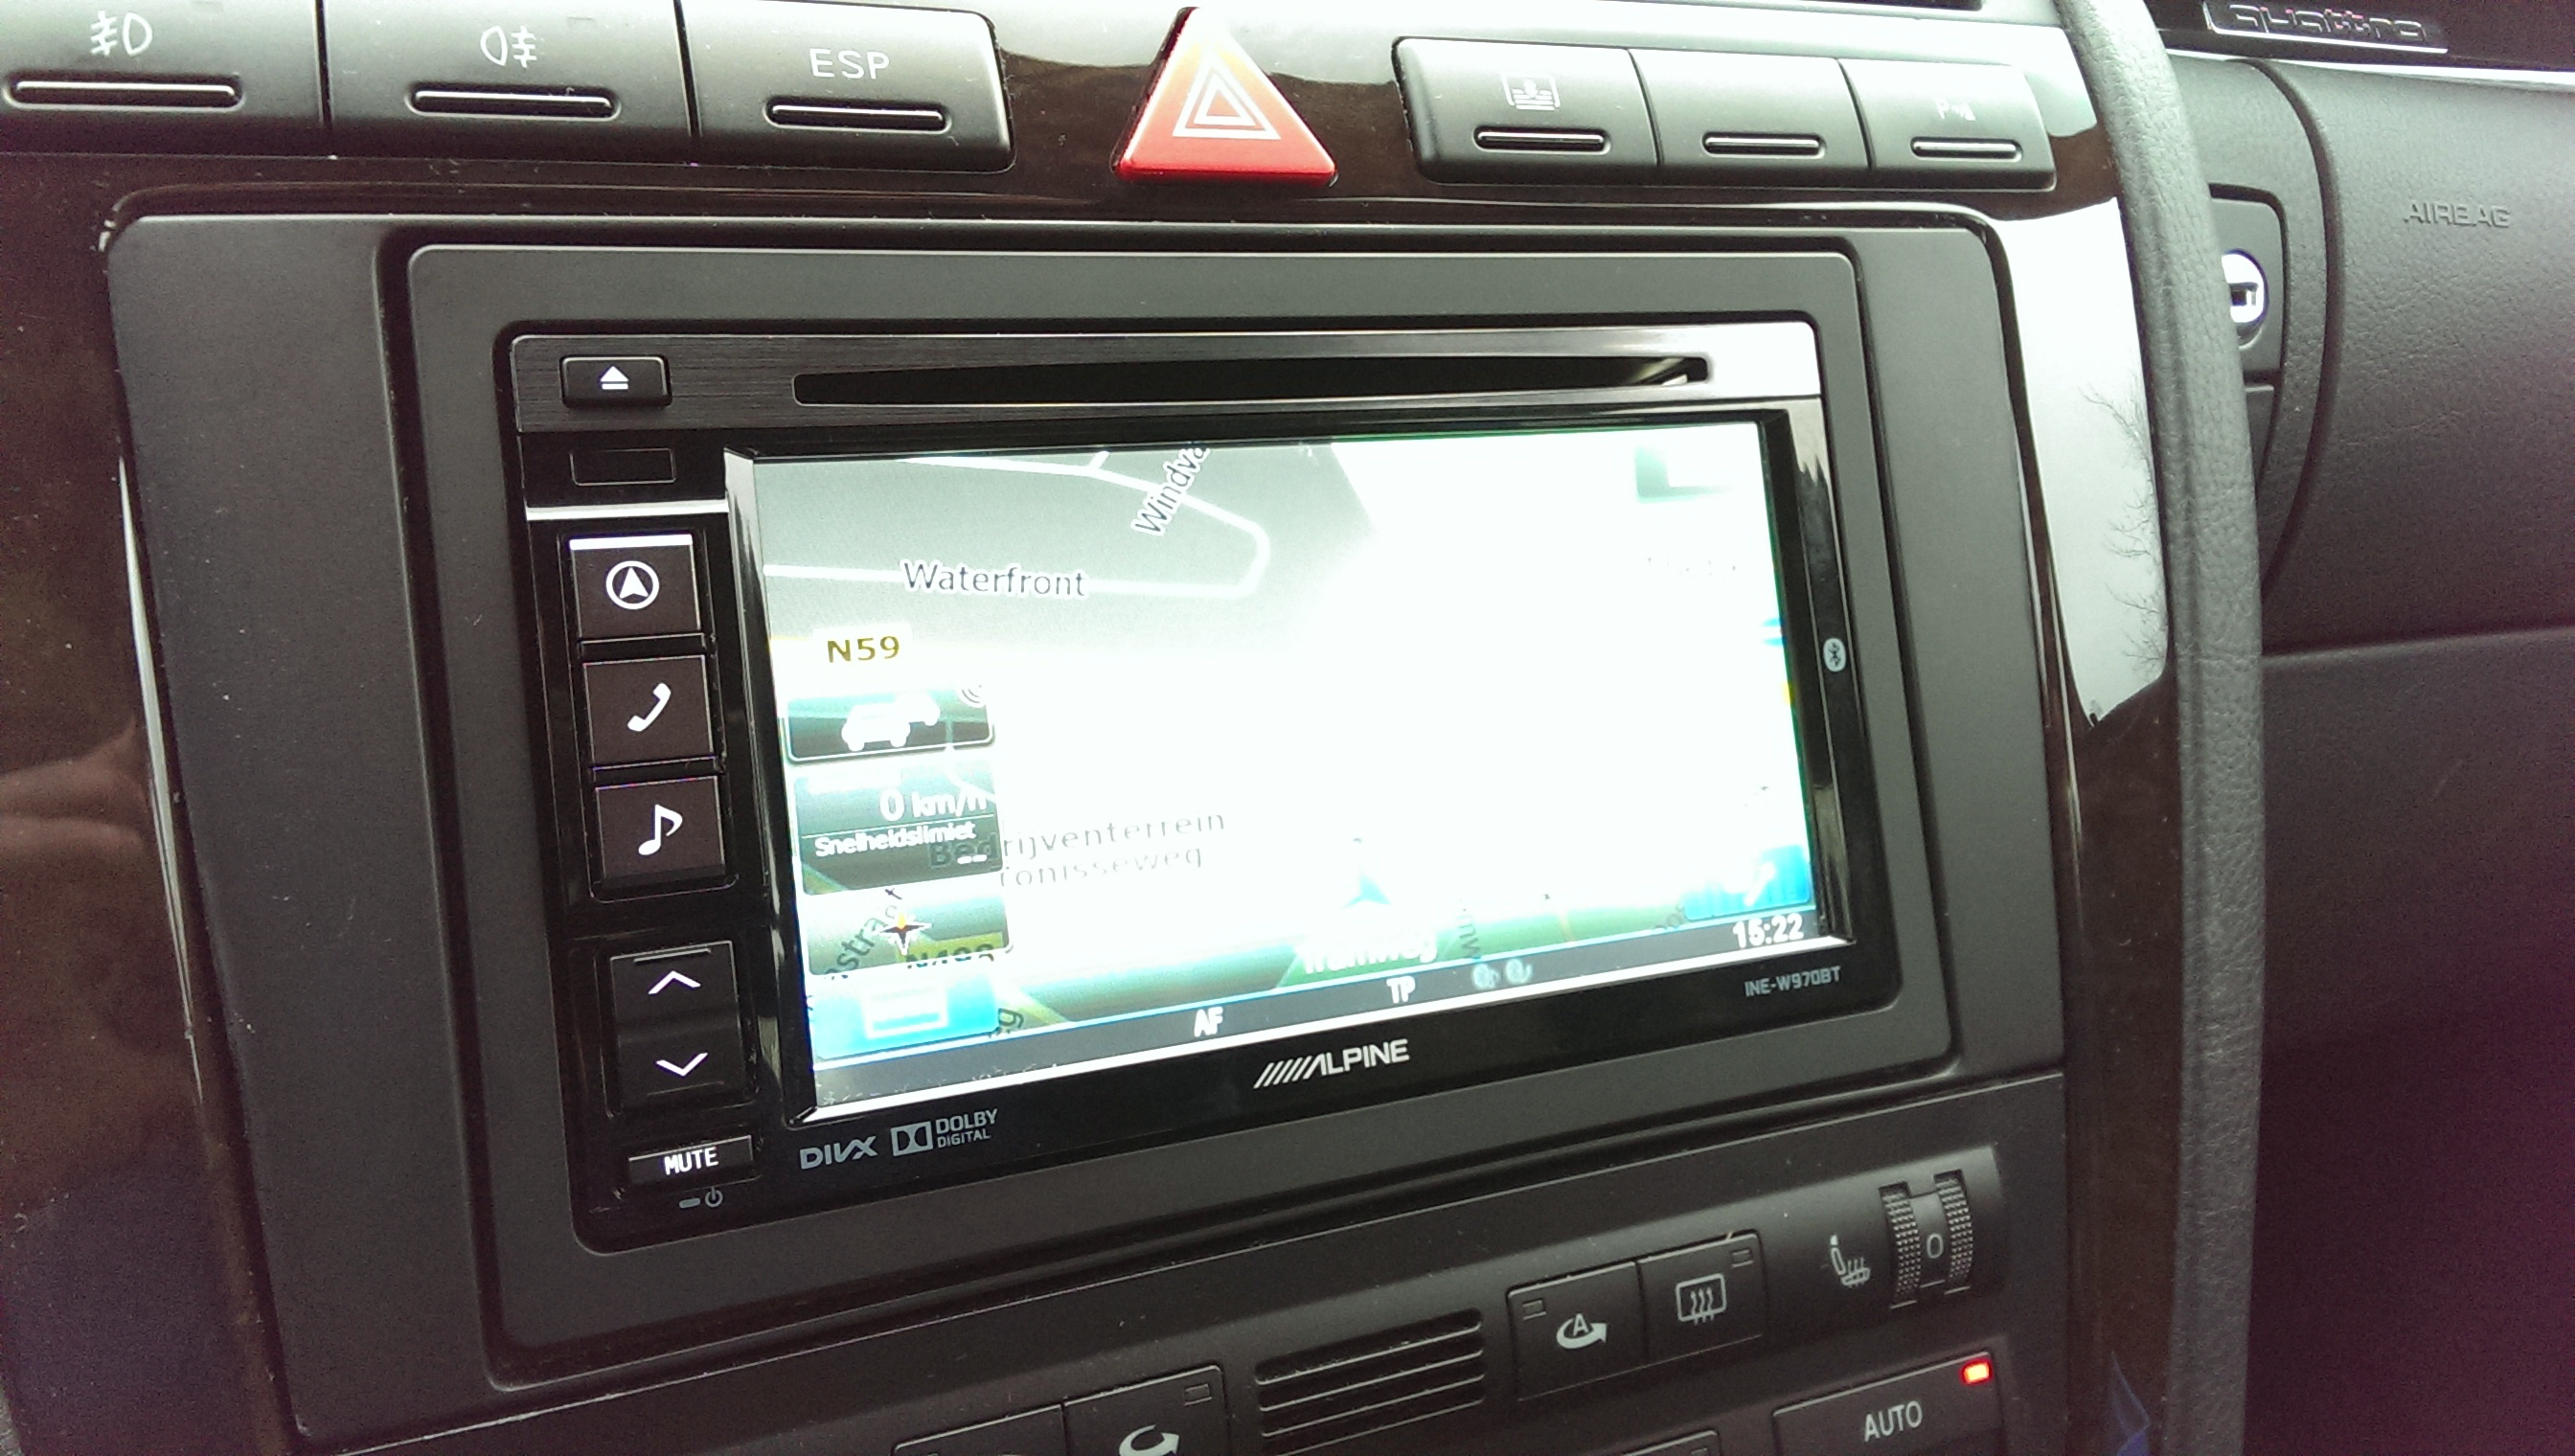 Audi A8 2 Din Ombouw Incl Bose Versterker Vervanging